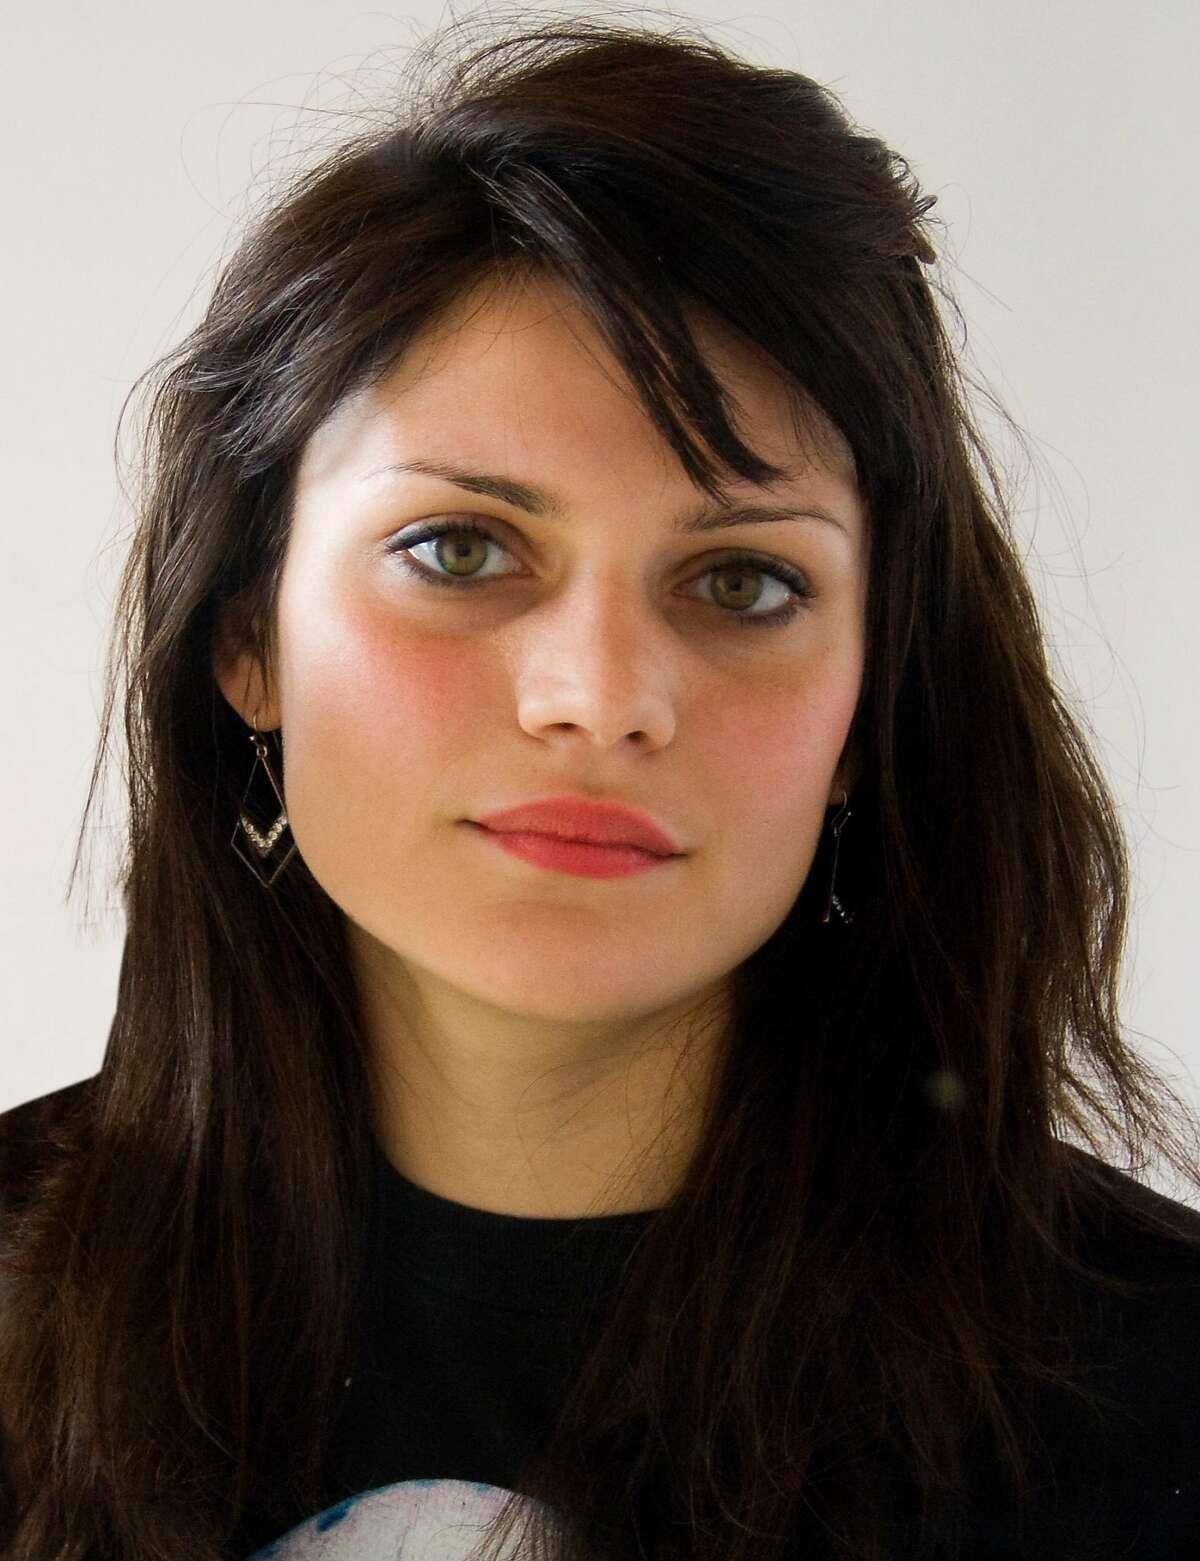 Artist Diana Al-Hadid